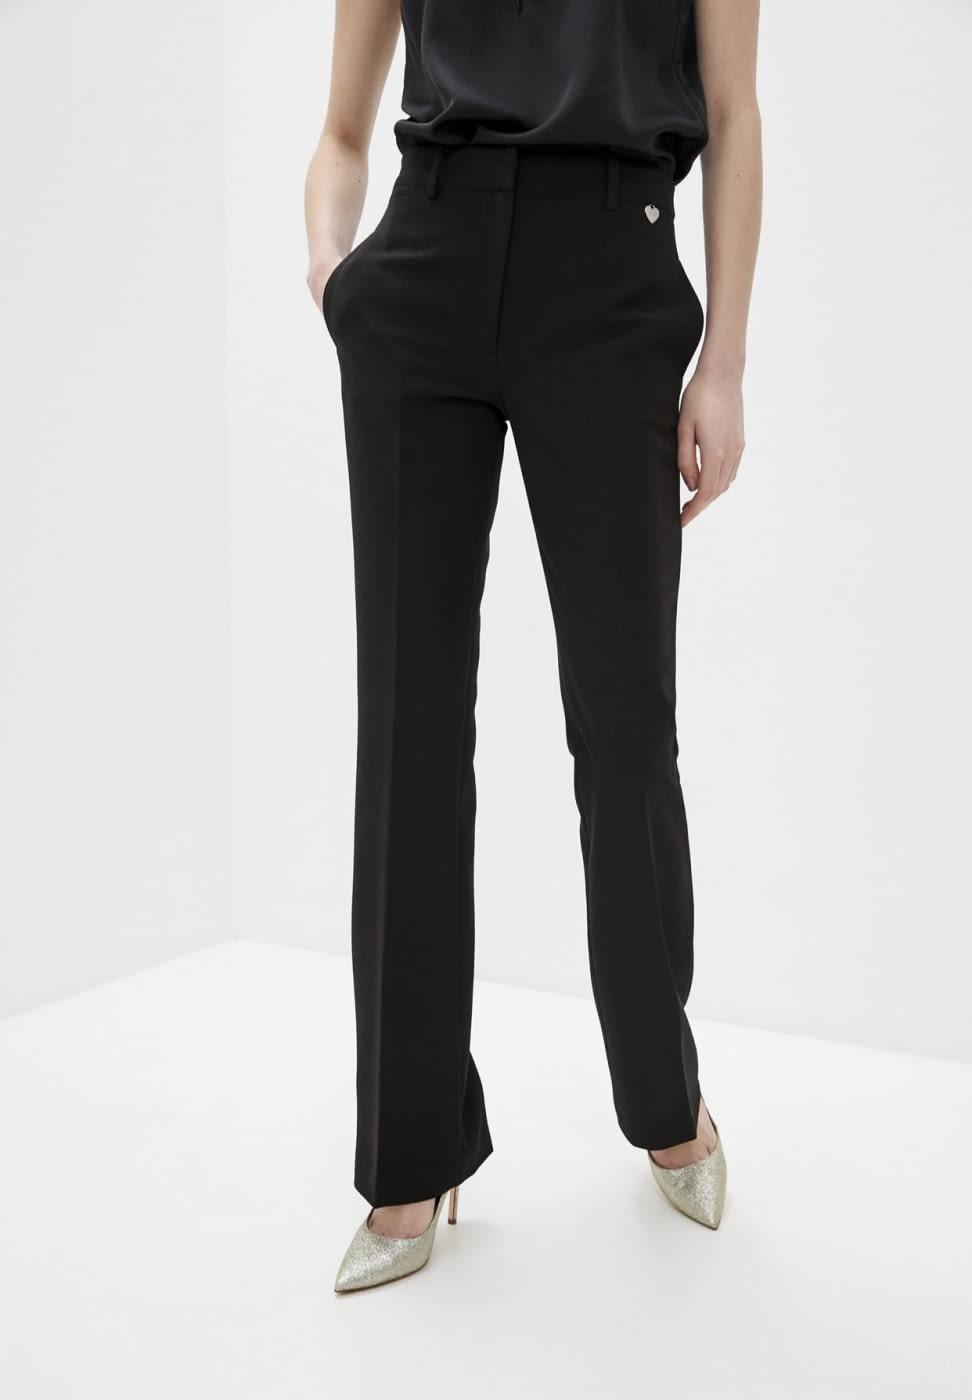 TWINSET pantalón color negro